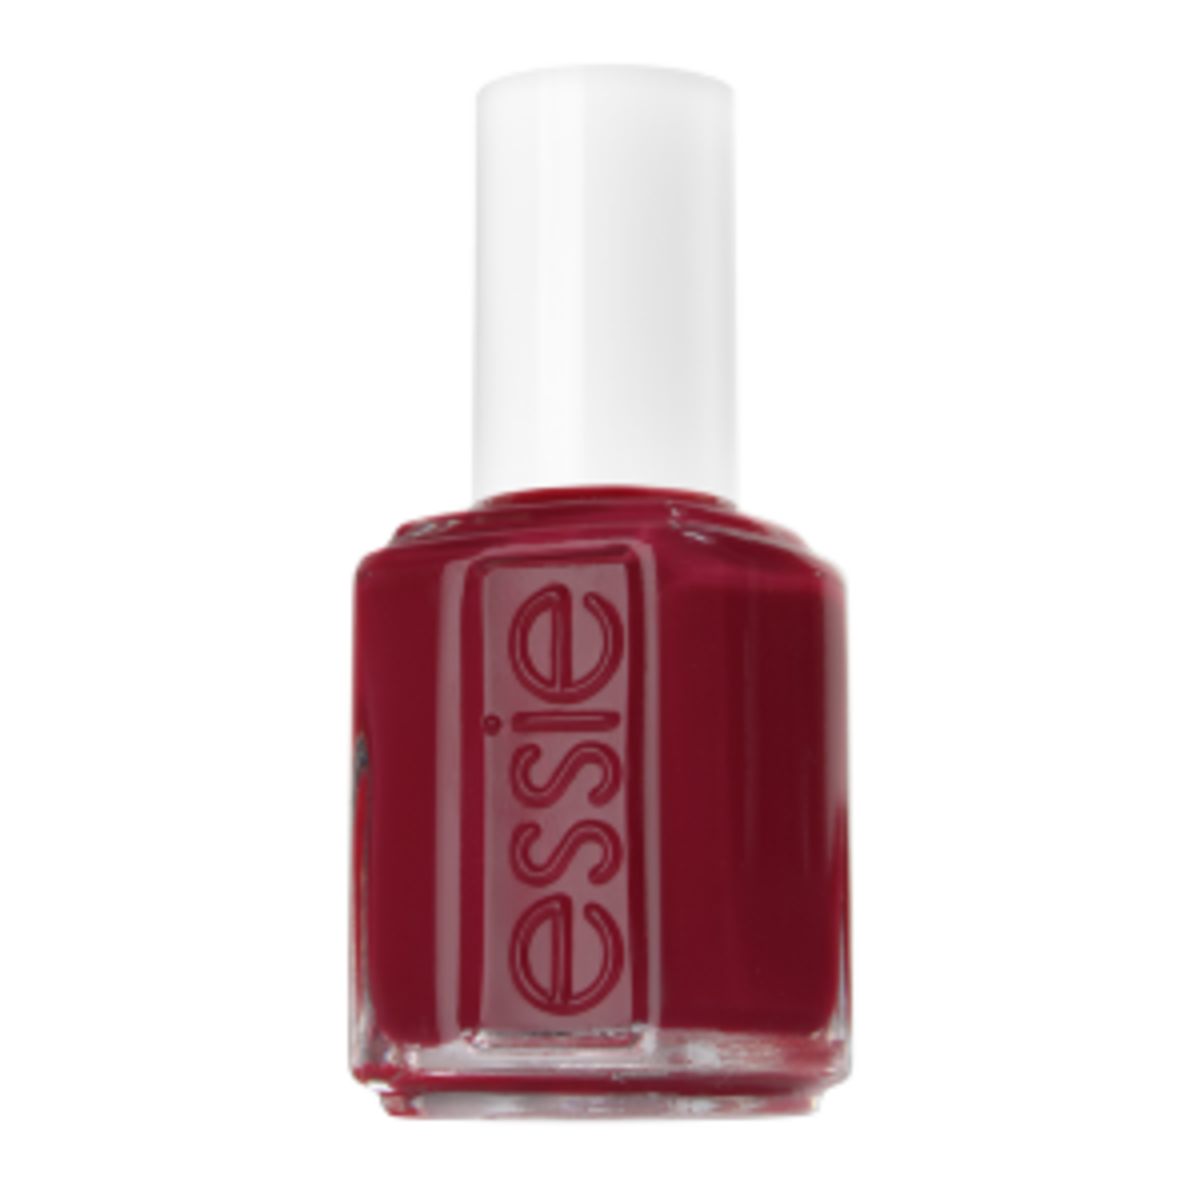 Essie-Fishnet-Stockings